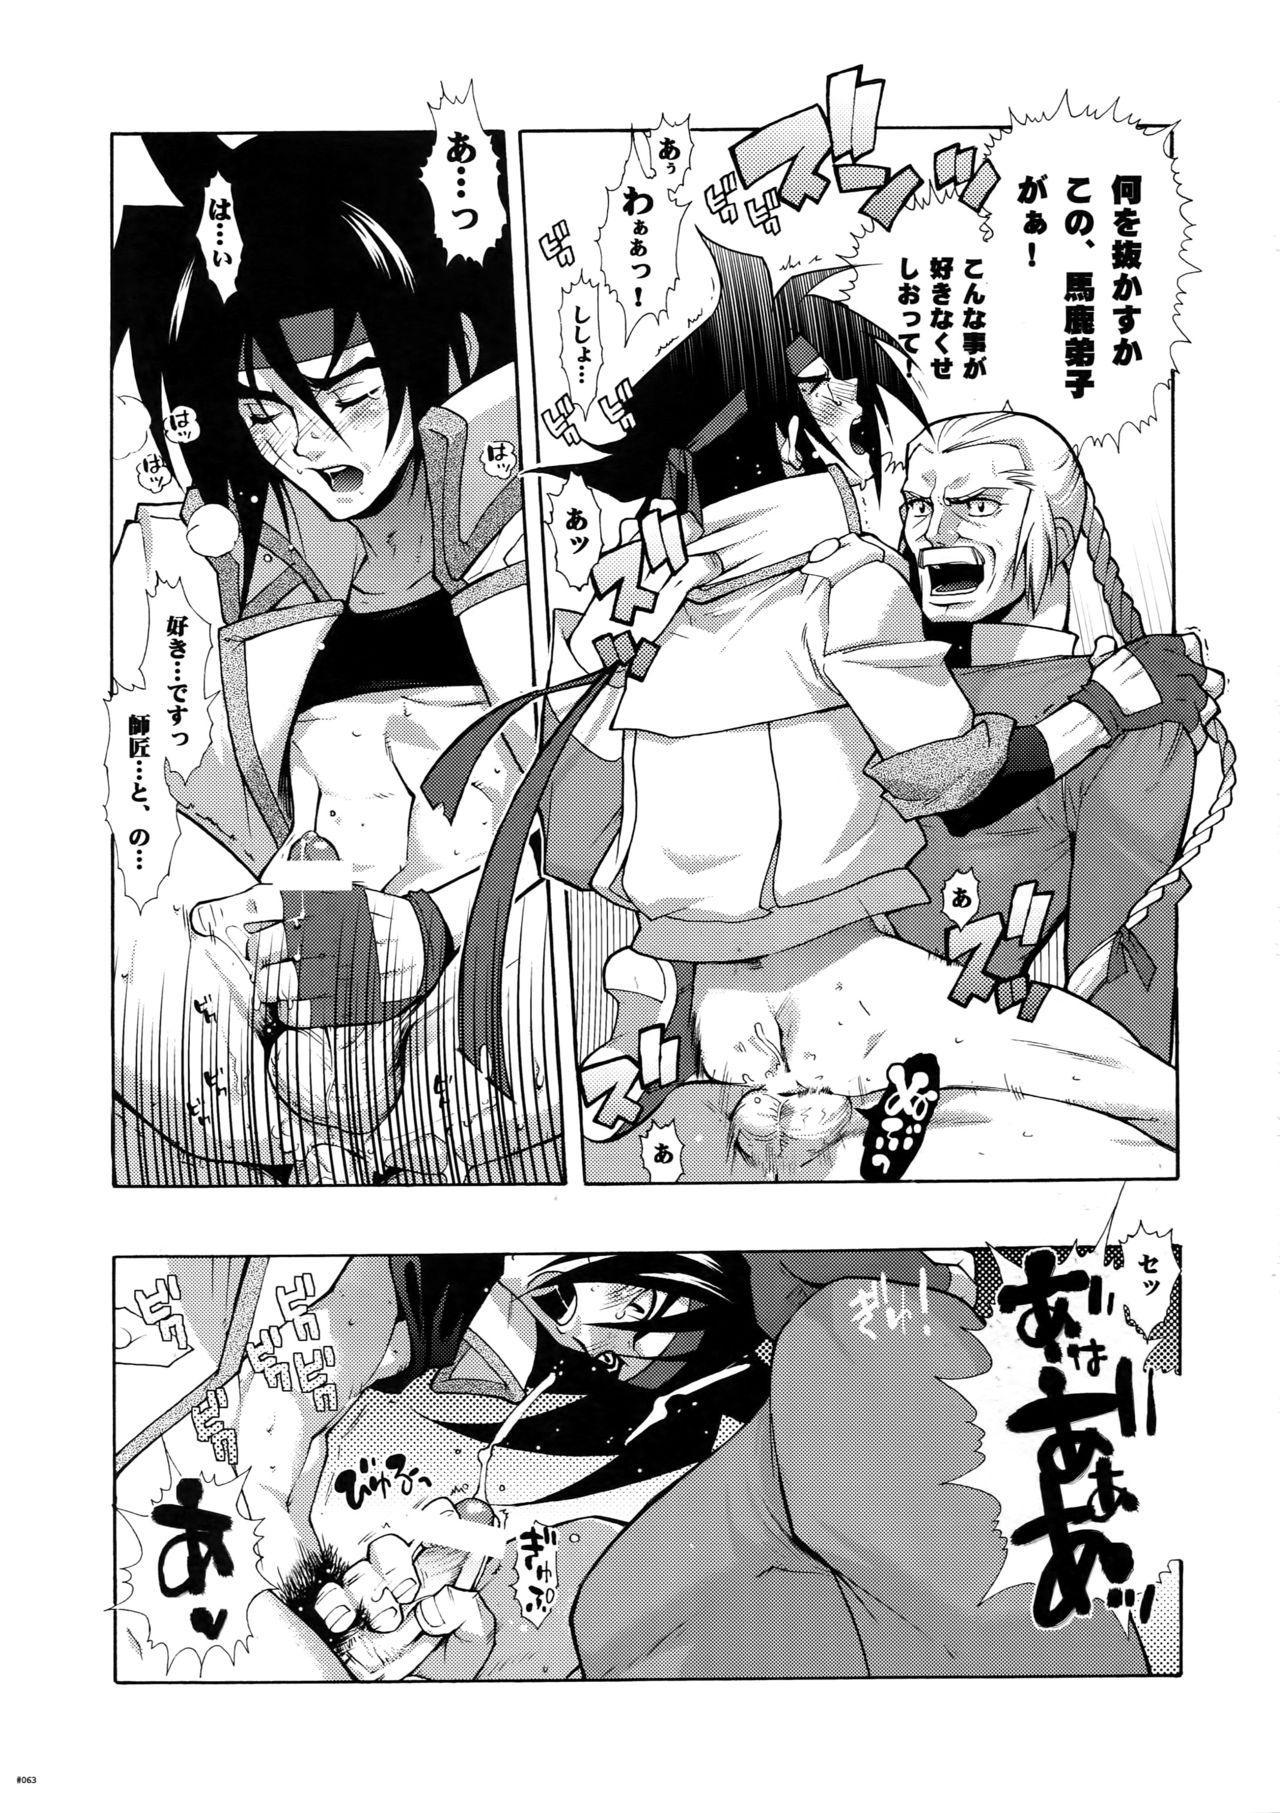 [Article 60 of Criminal Code (Shuhan)] G-gan Josei-Muke Sairoku-Shuu (G Gundam) 62